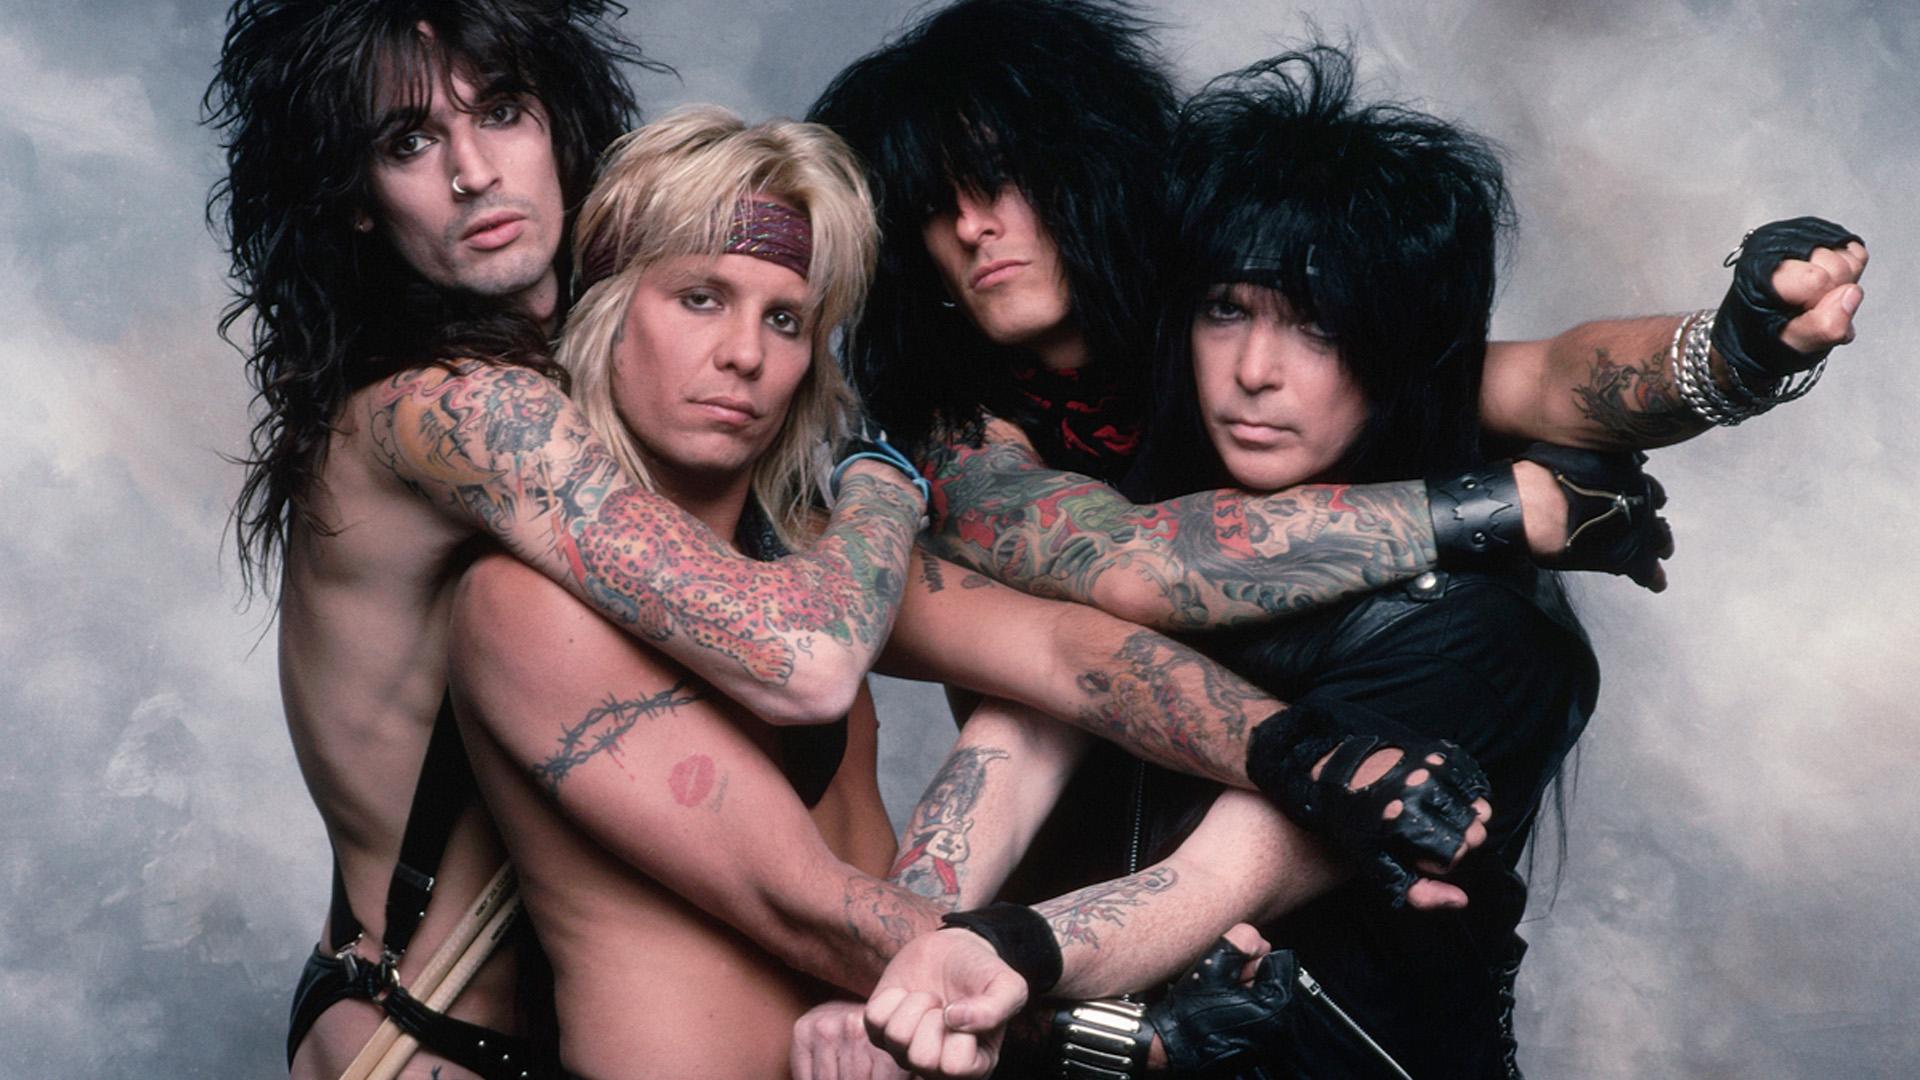 Looks That Kill av Mötley Crüe